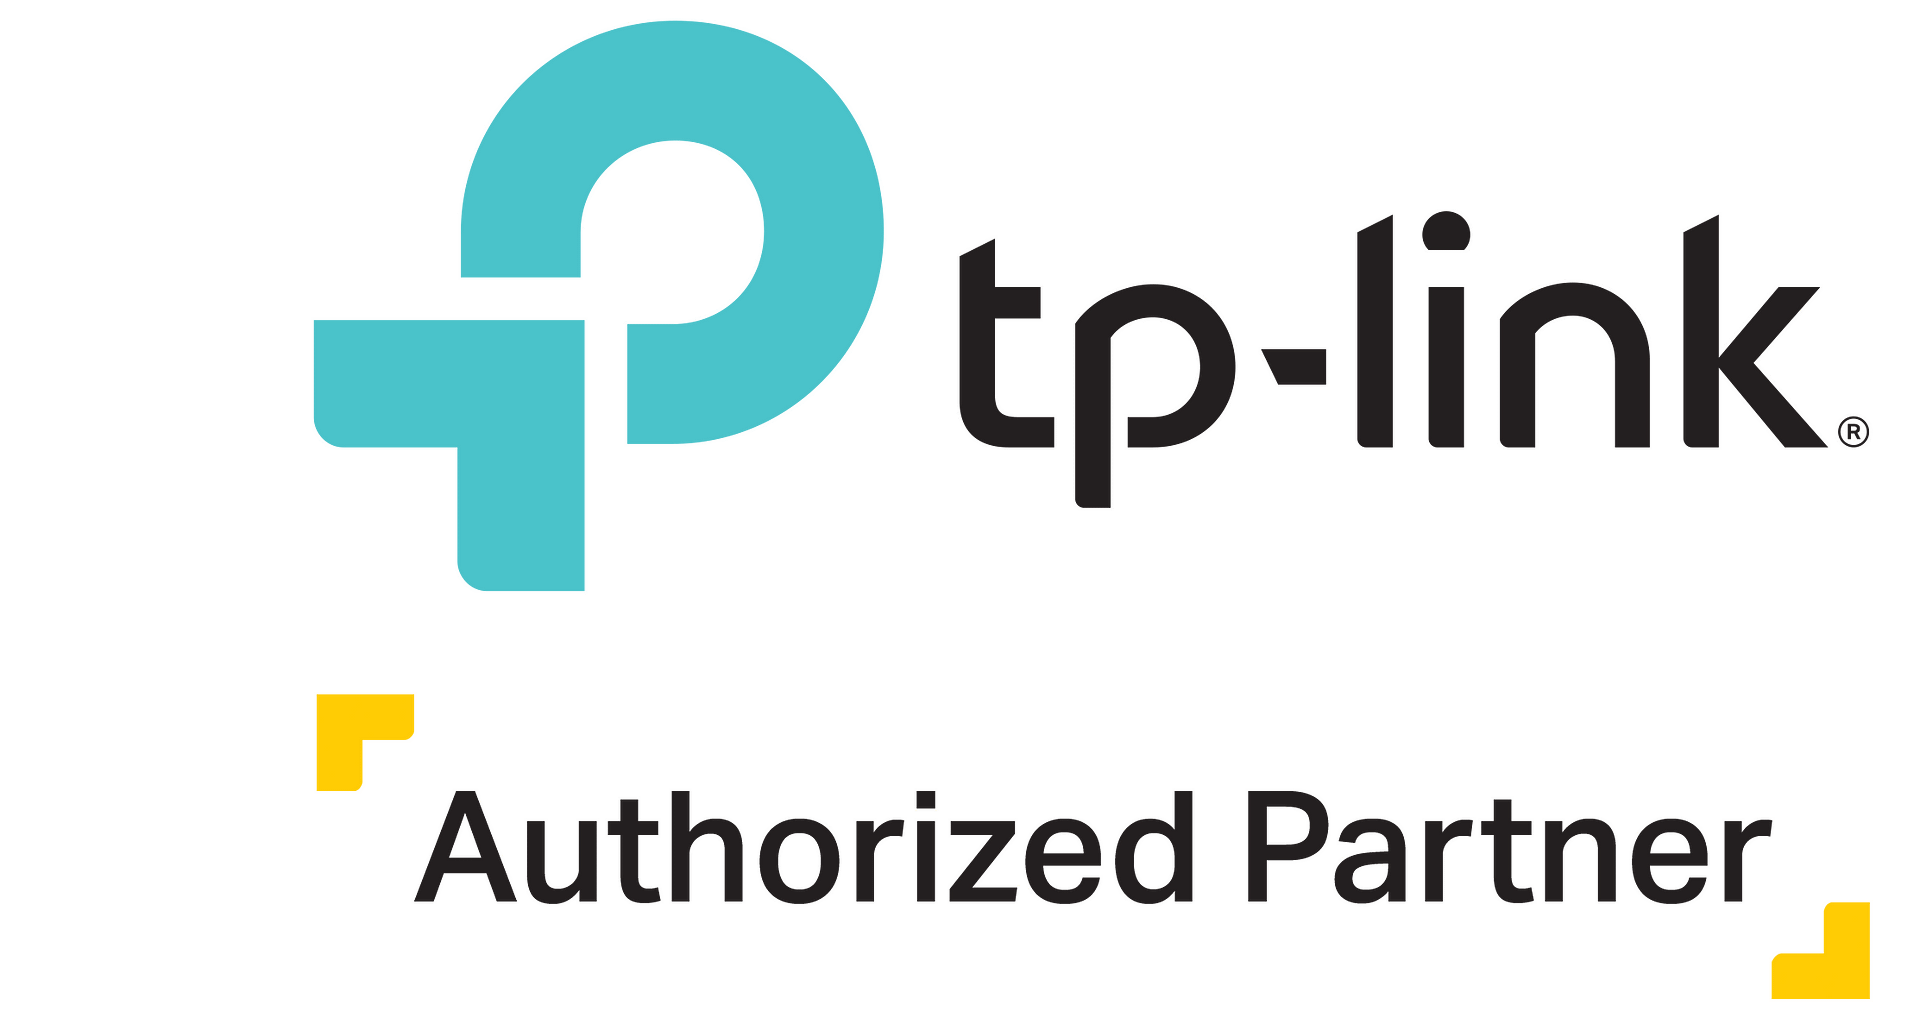 TP Link Authorized Partner